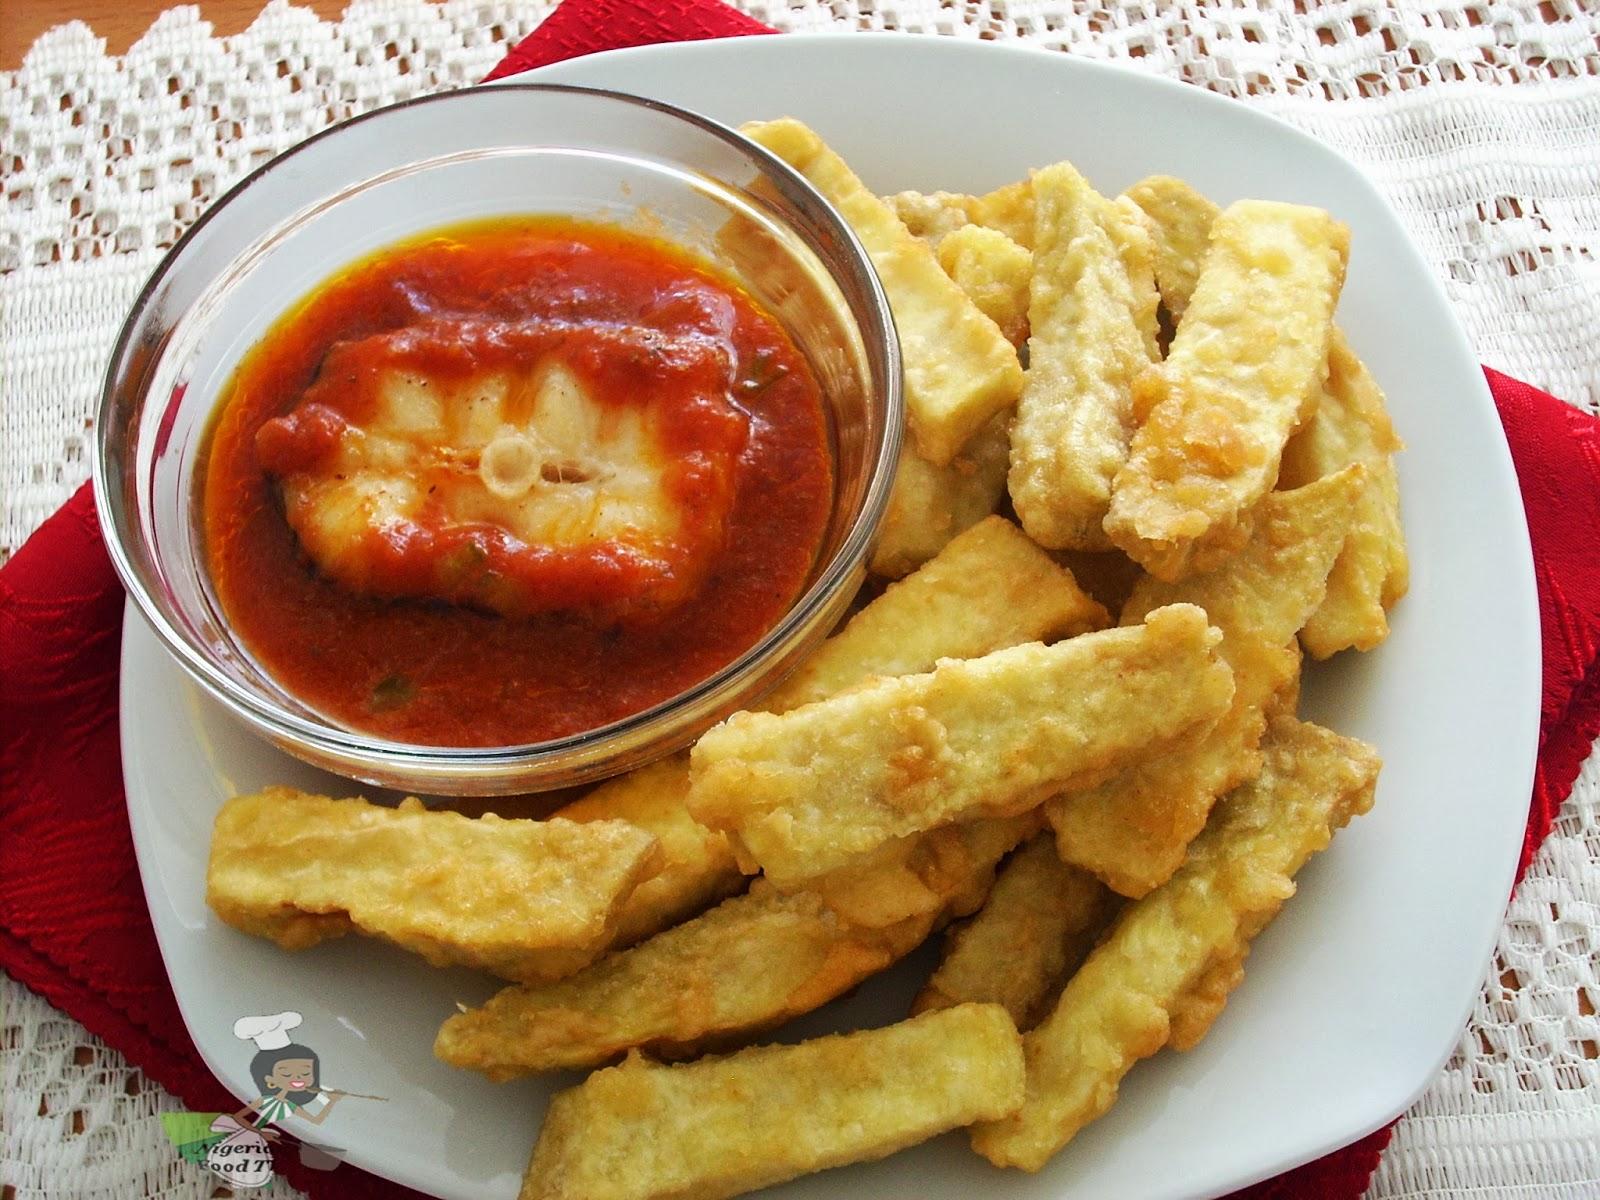 Yamarita   Dun Dun Oniyeri (Egg Coated Yam fries)